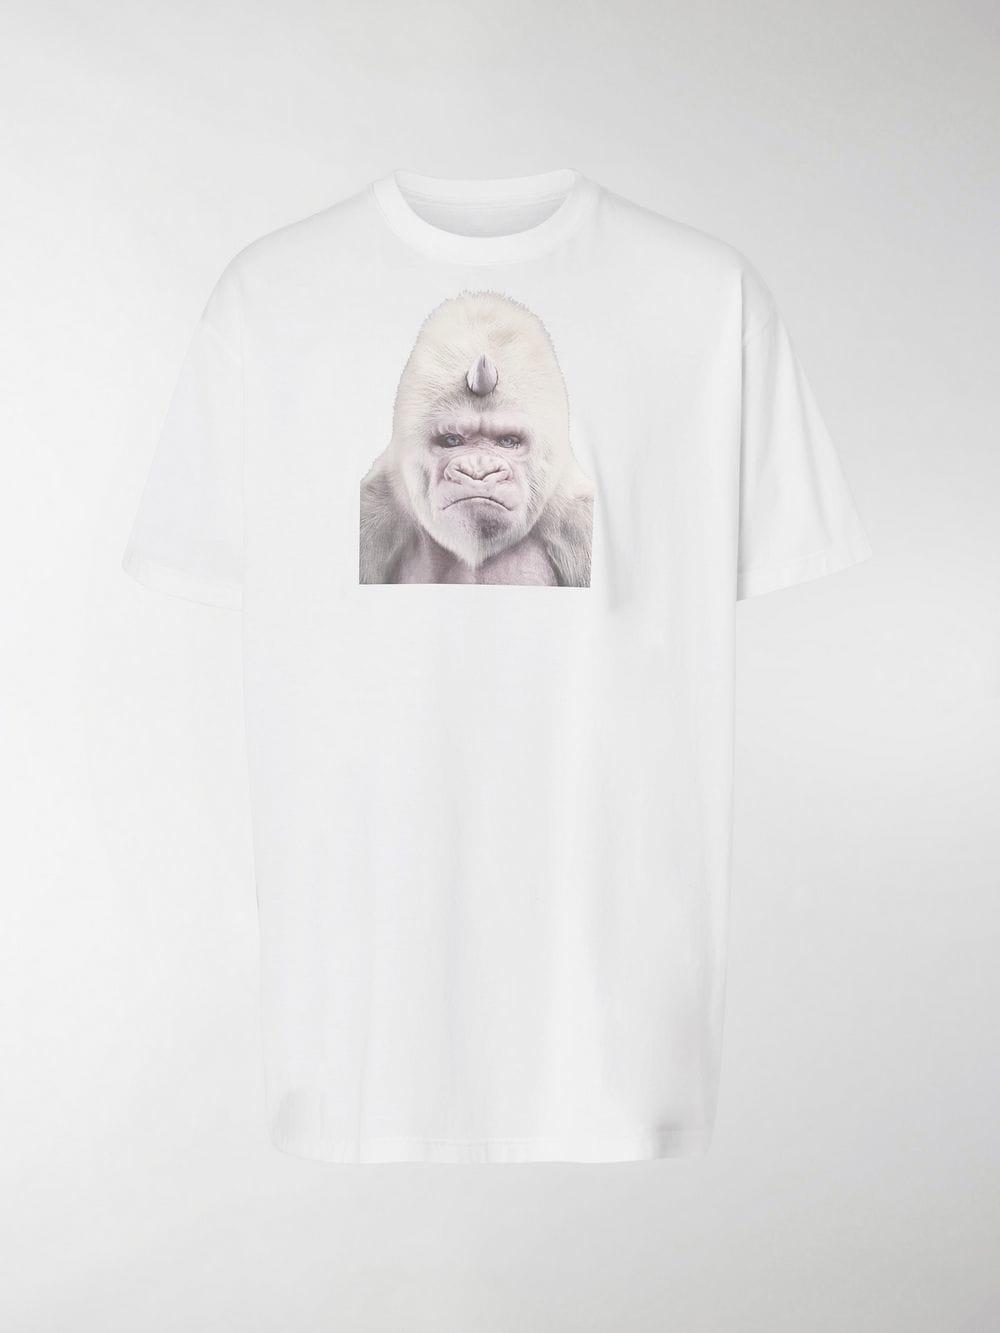 d1f1b0acf Burberry Gorilla Print Cotton T-shirt in White for Men - Lyst